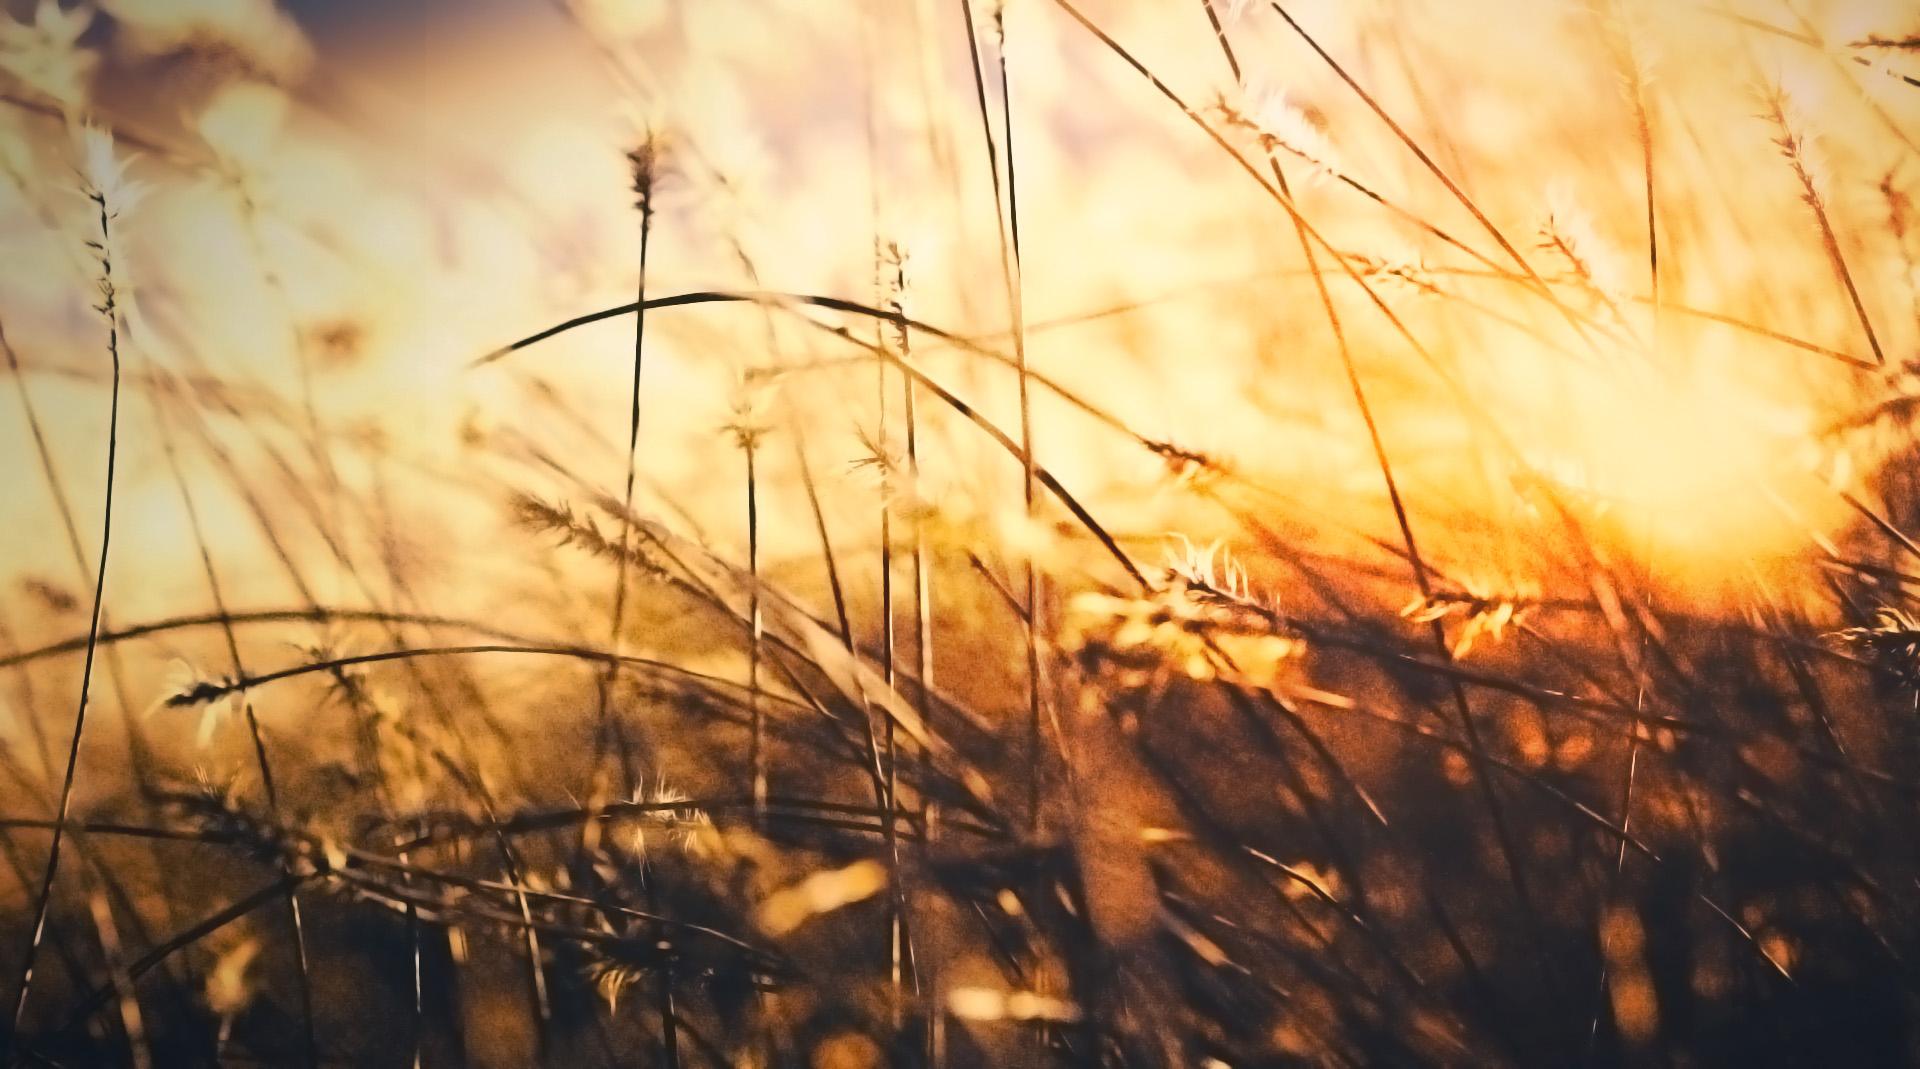 translucent grass material